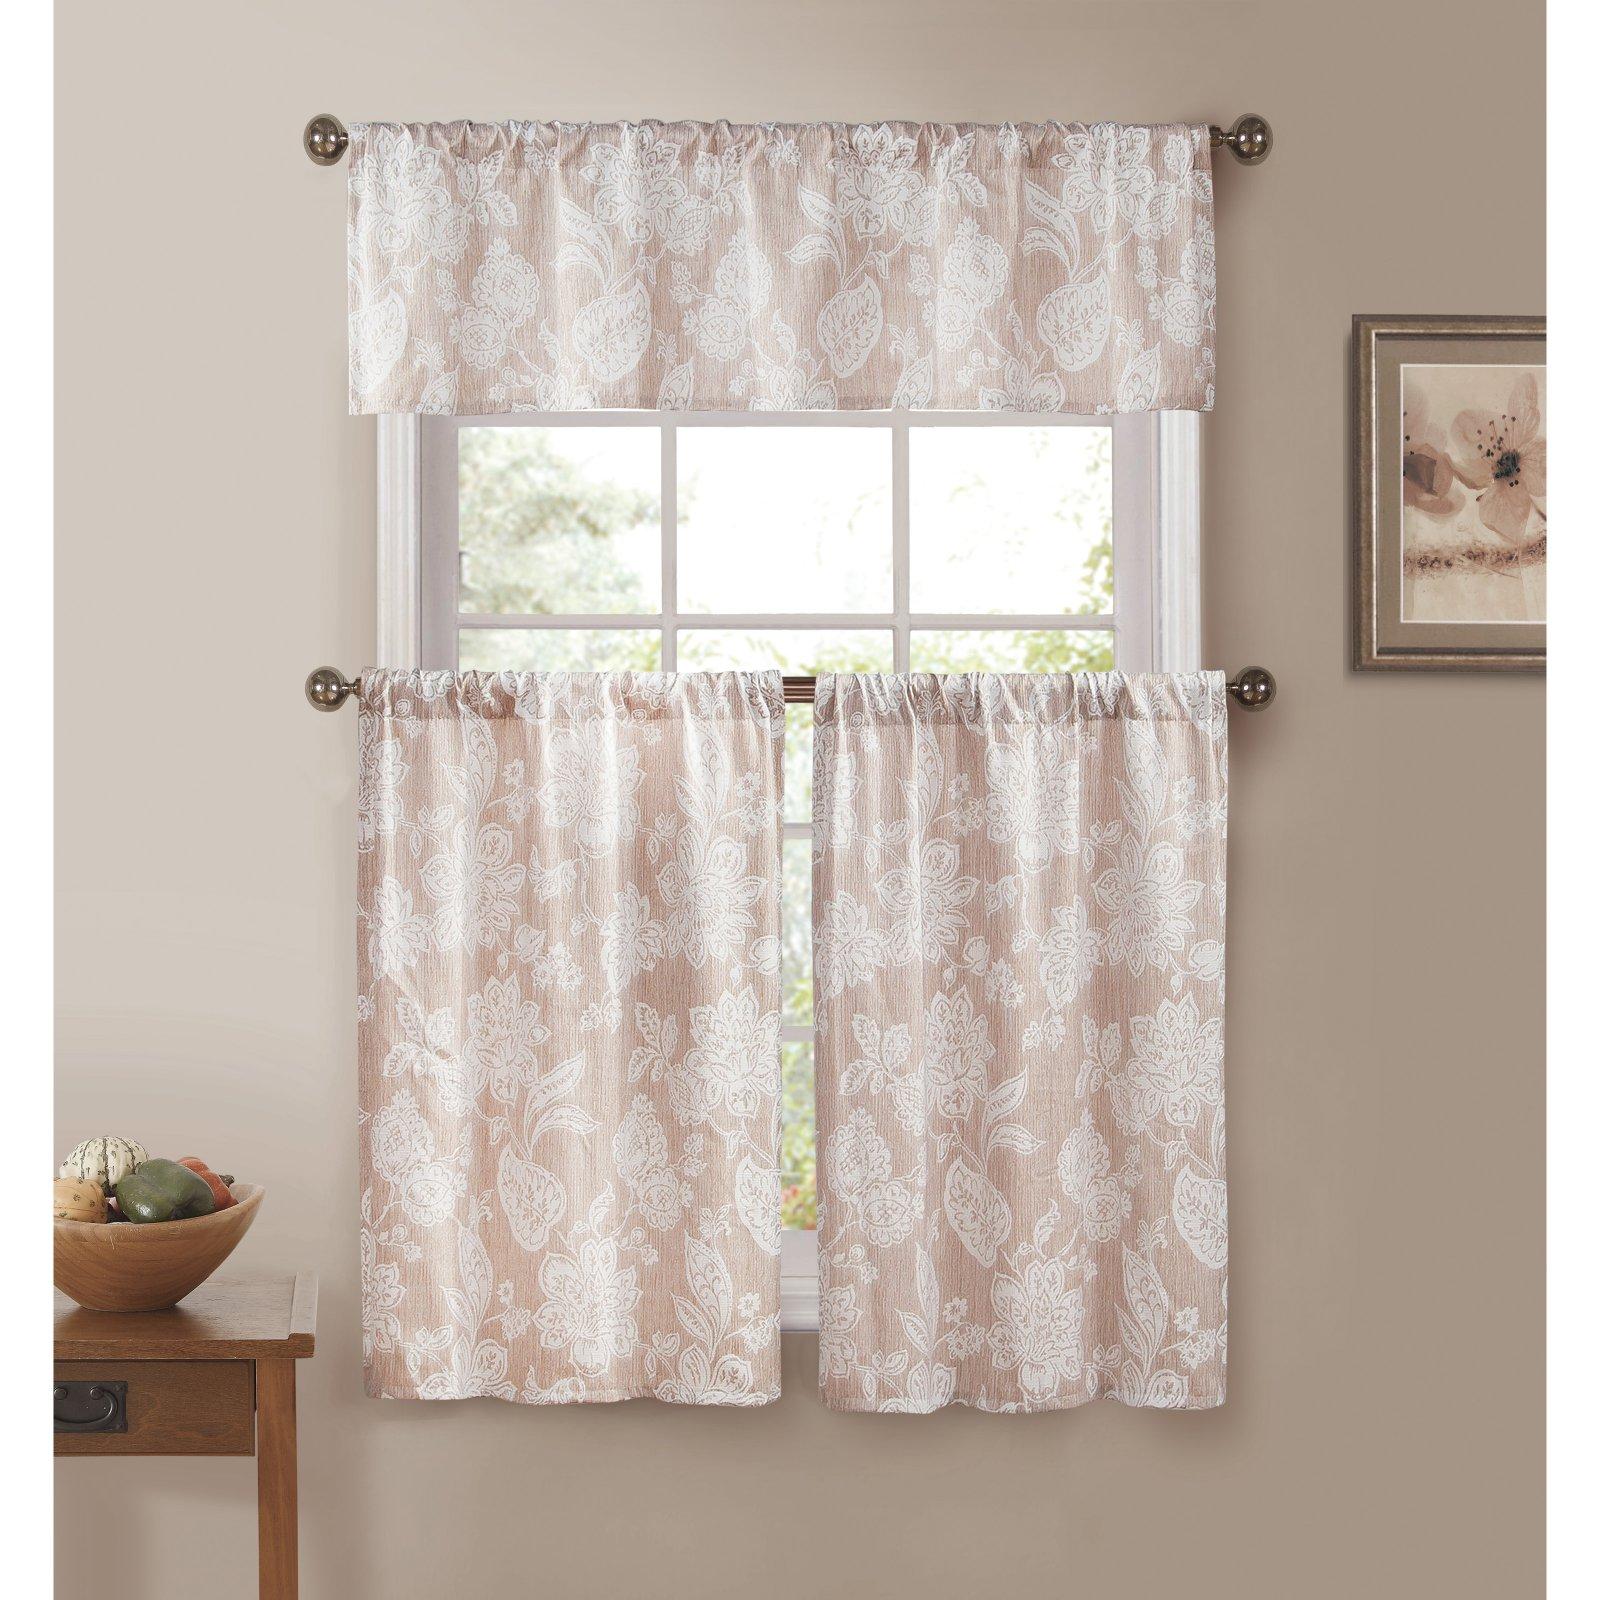 Duck River Ewva Linen Look Jacquard 3 Piece Kitchen Curtain Set